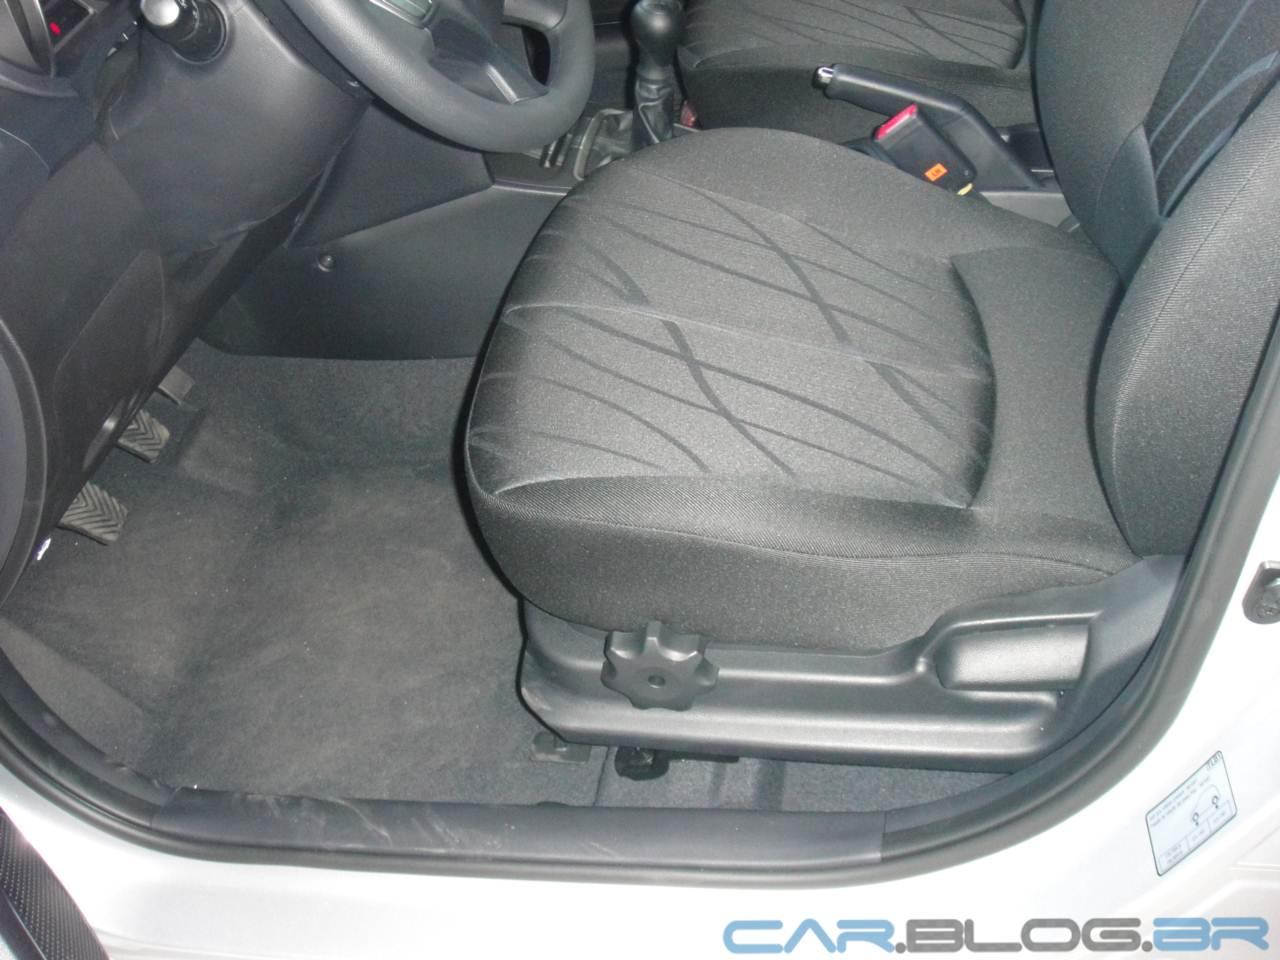 Hyundai HB20 x Volkswagen up! - espaço interno